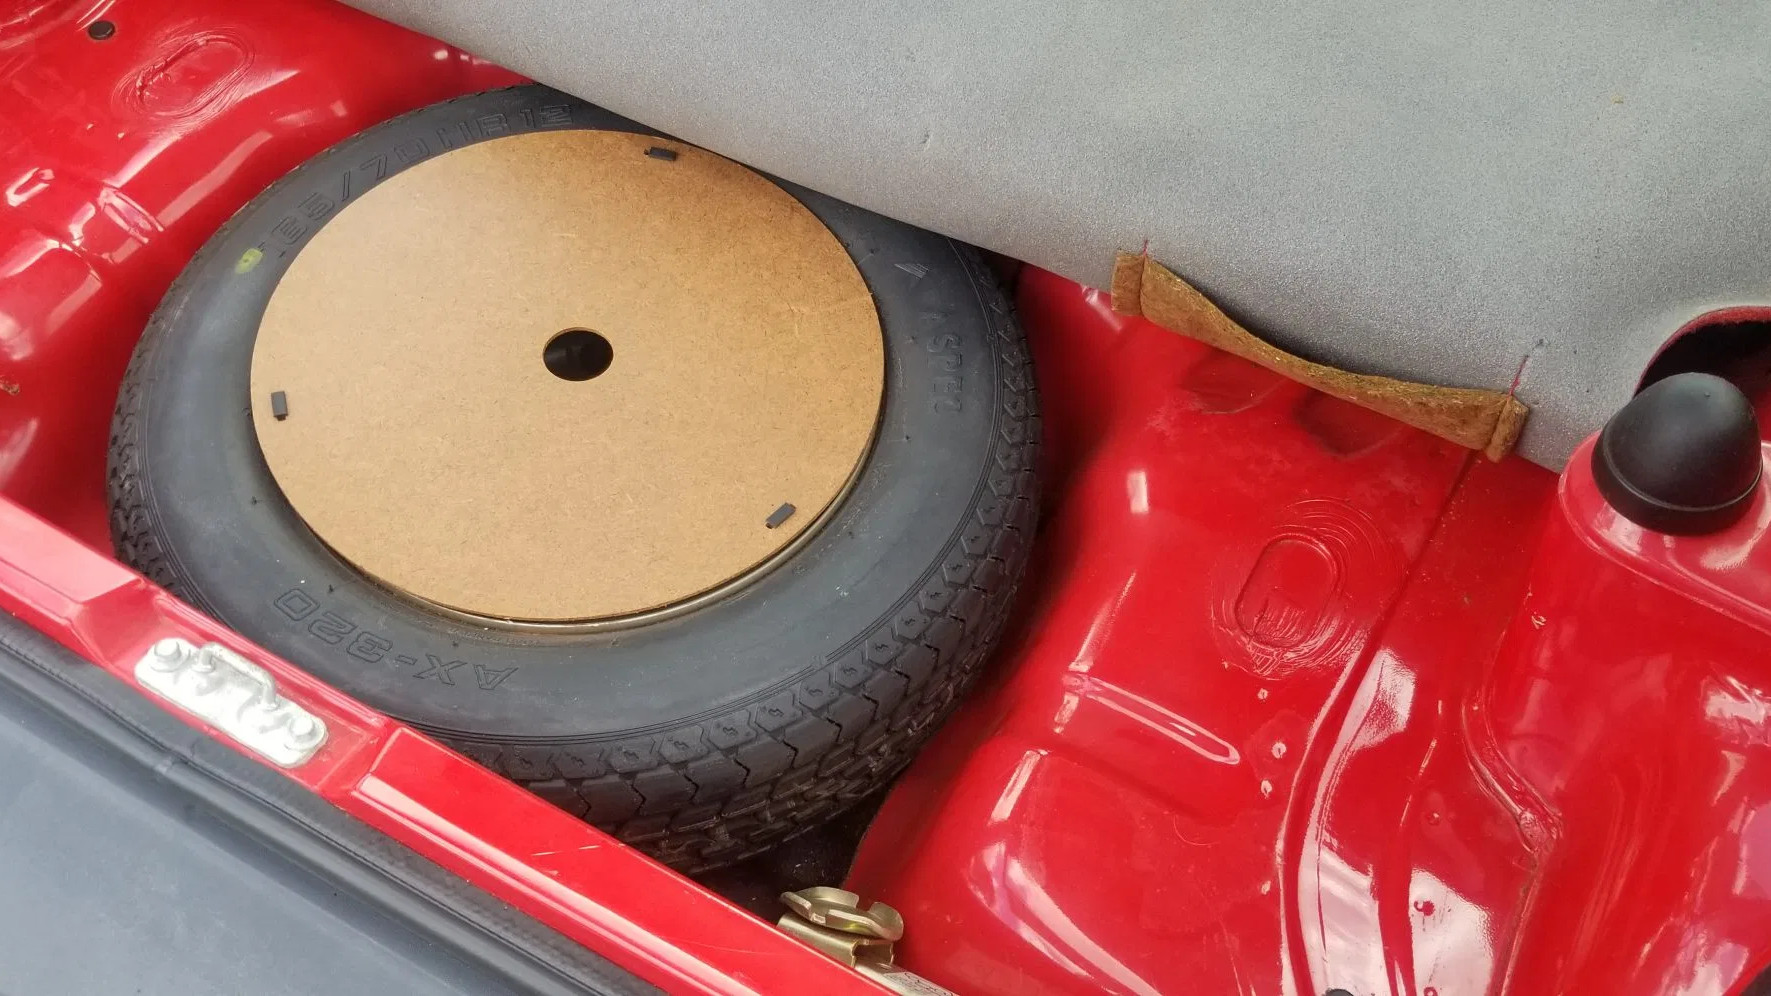 1983 Honda City Turbo spare tire